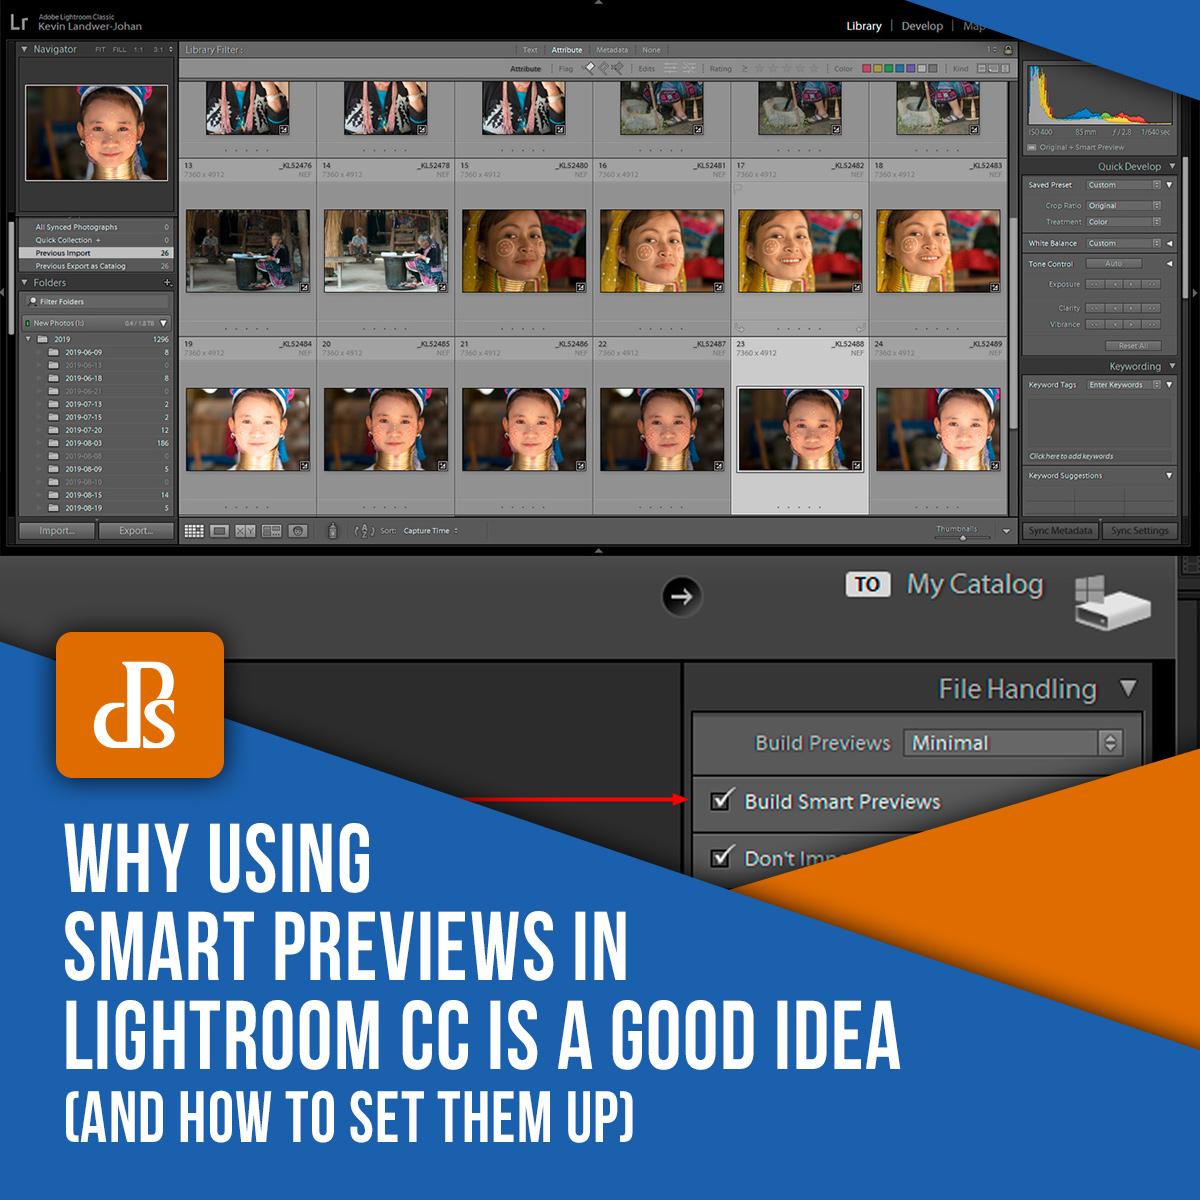 smart-previews-in-lightroom-cc